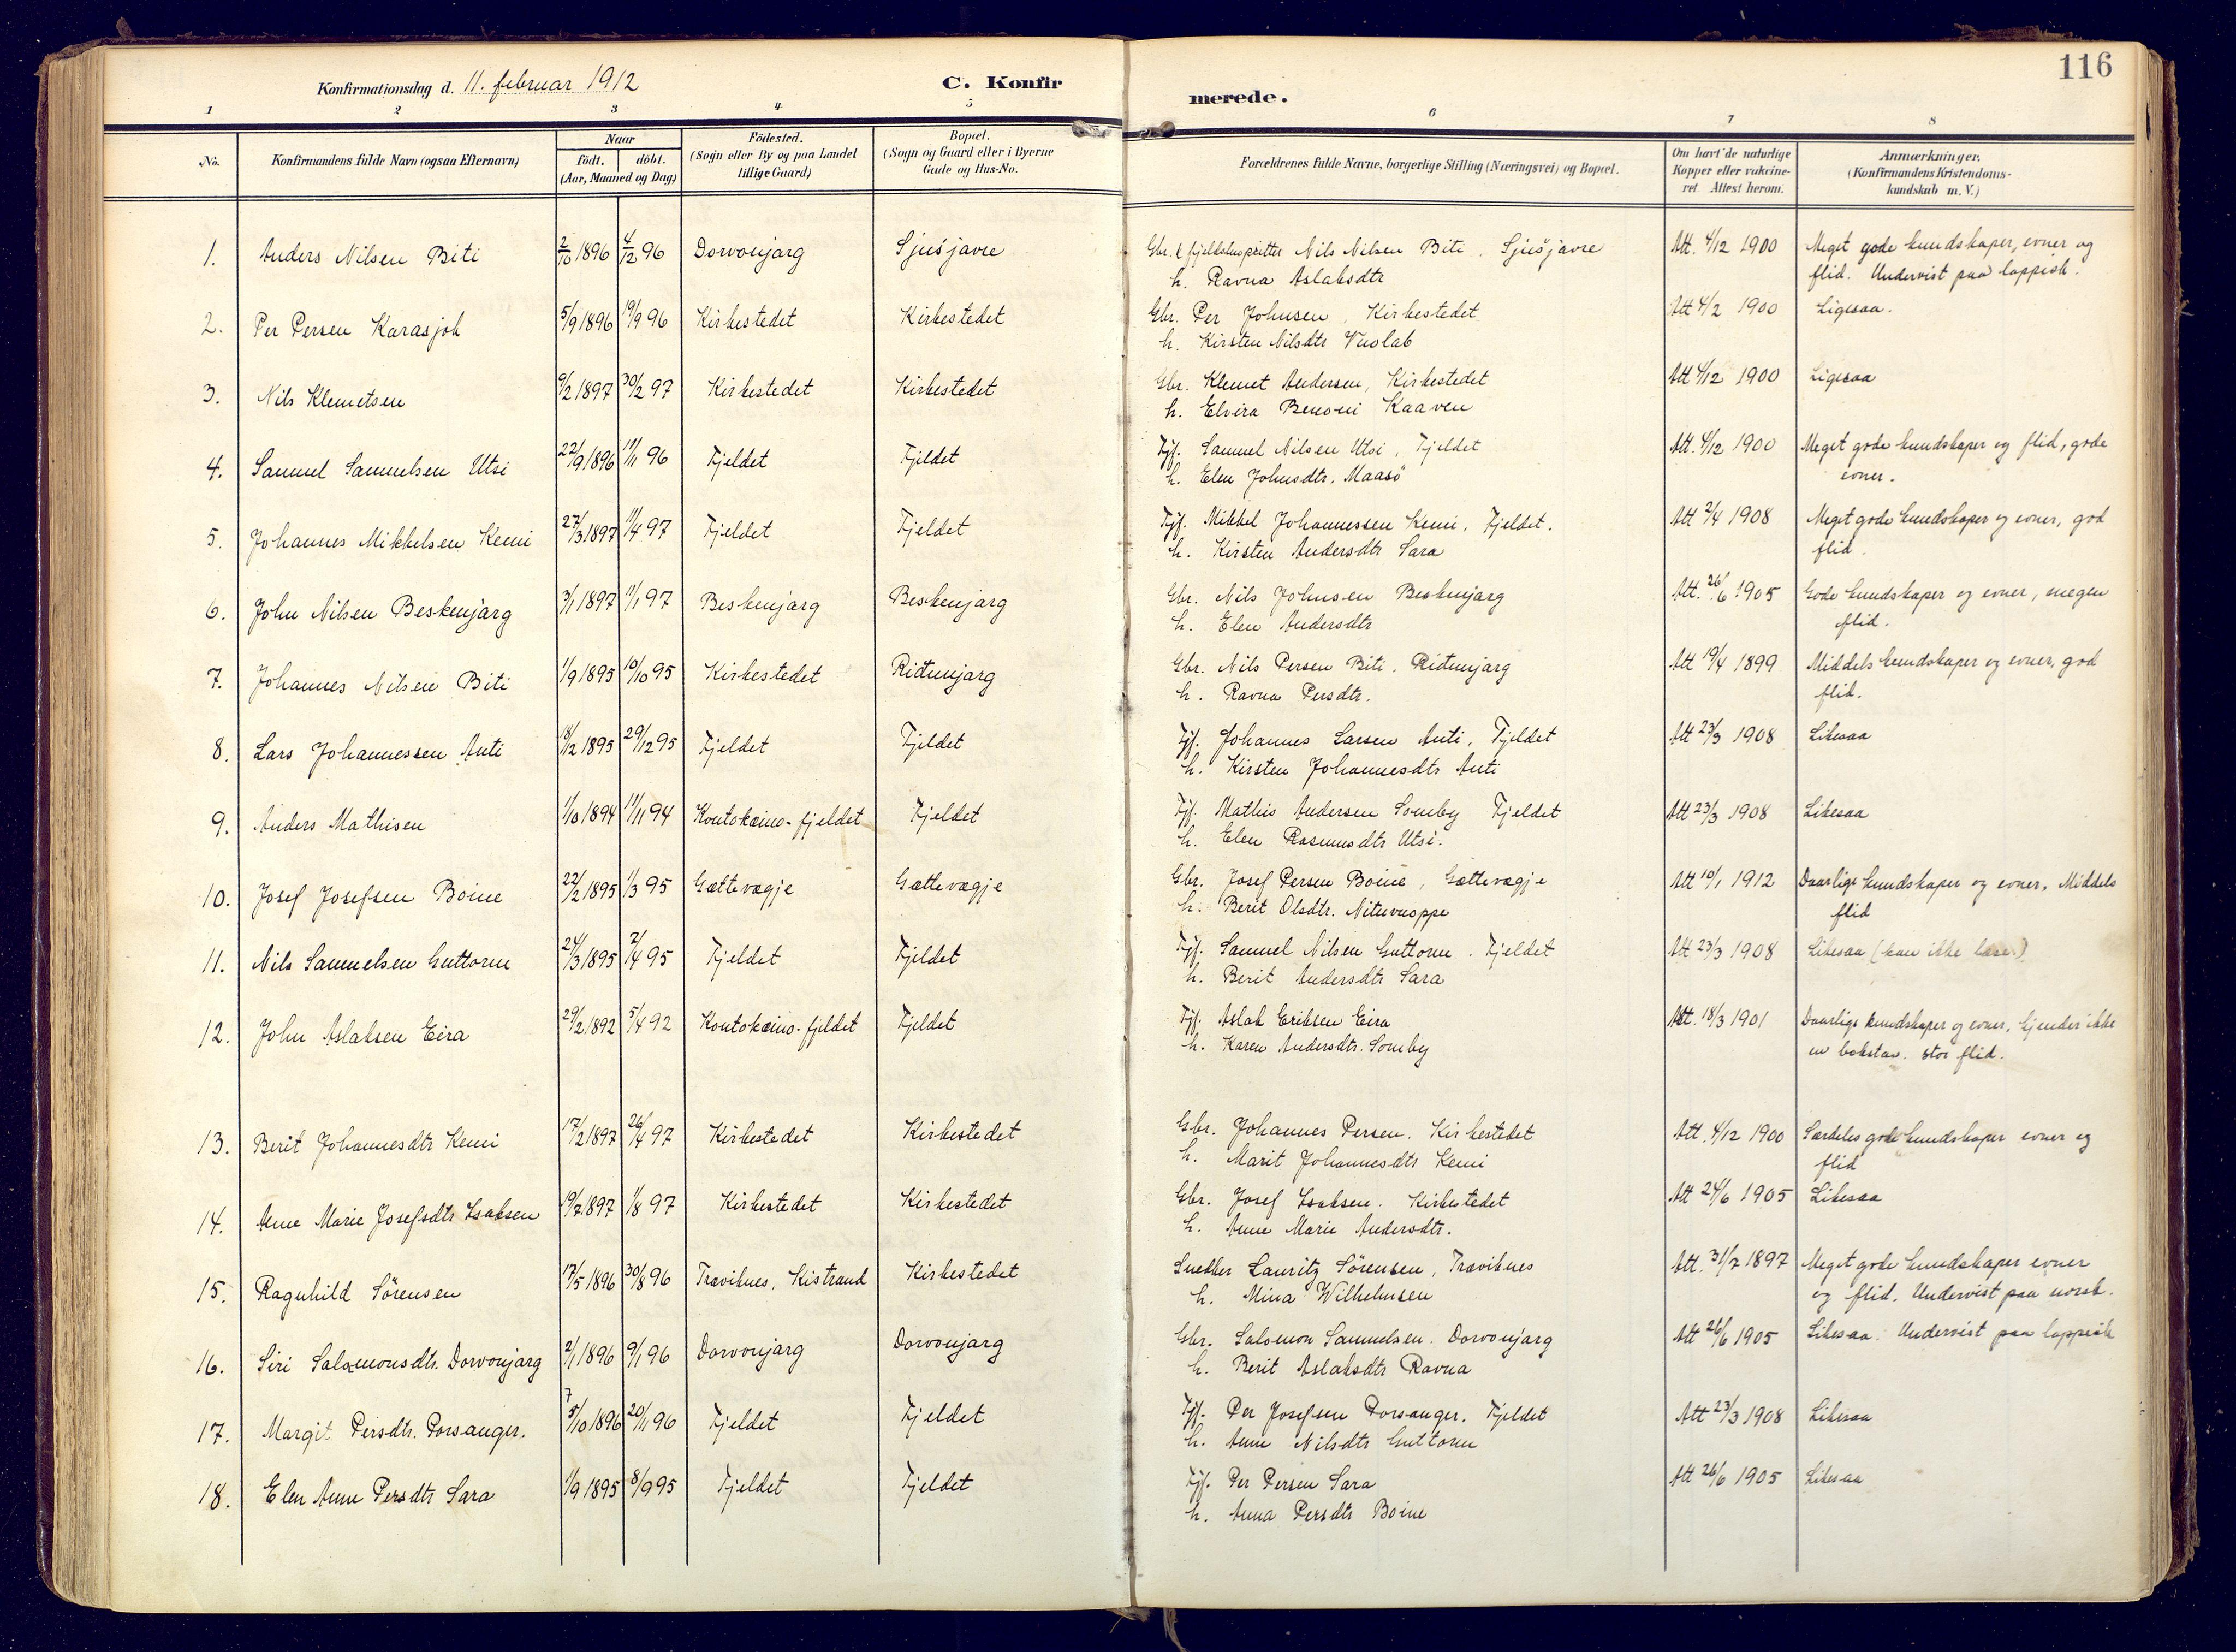 SATØ, Karasjok sokneprestkontor, H/Ha: Ministerialbok nr. 3, 1907-1926, s. 116